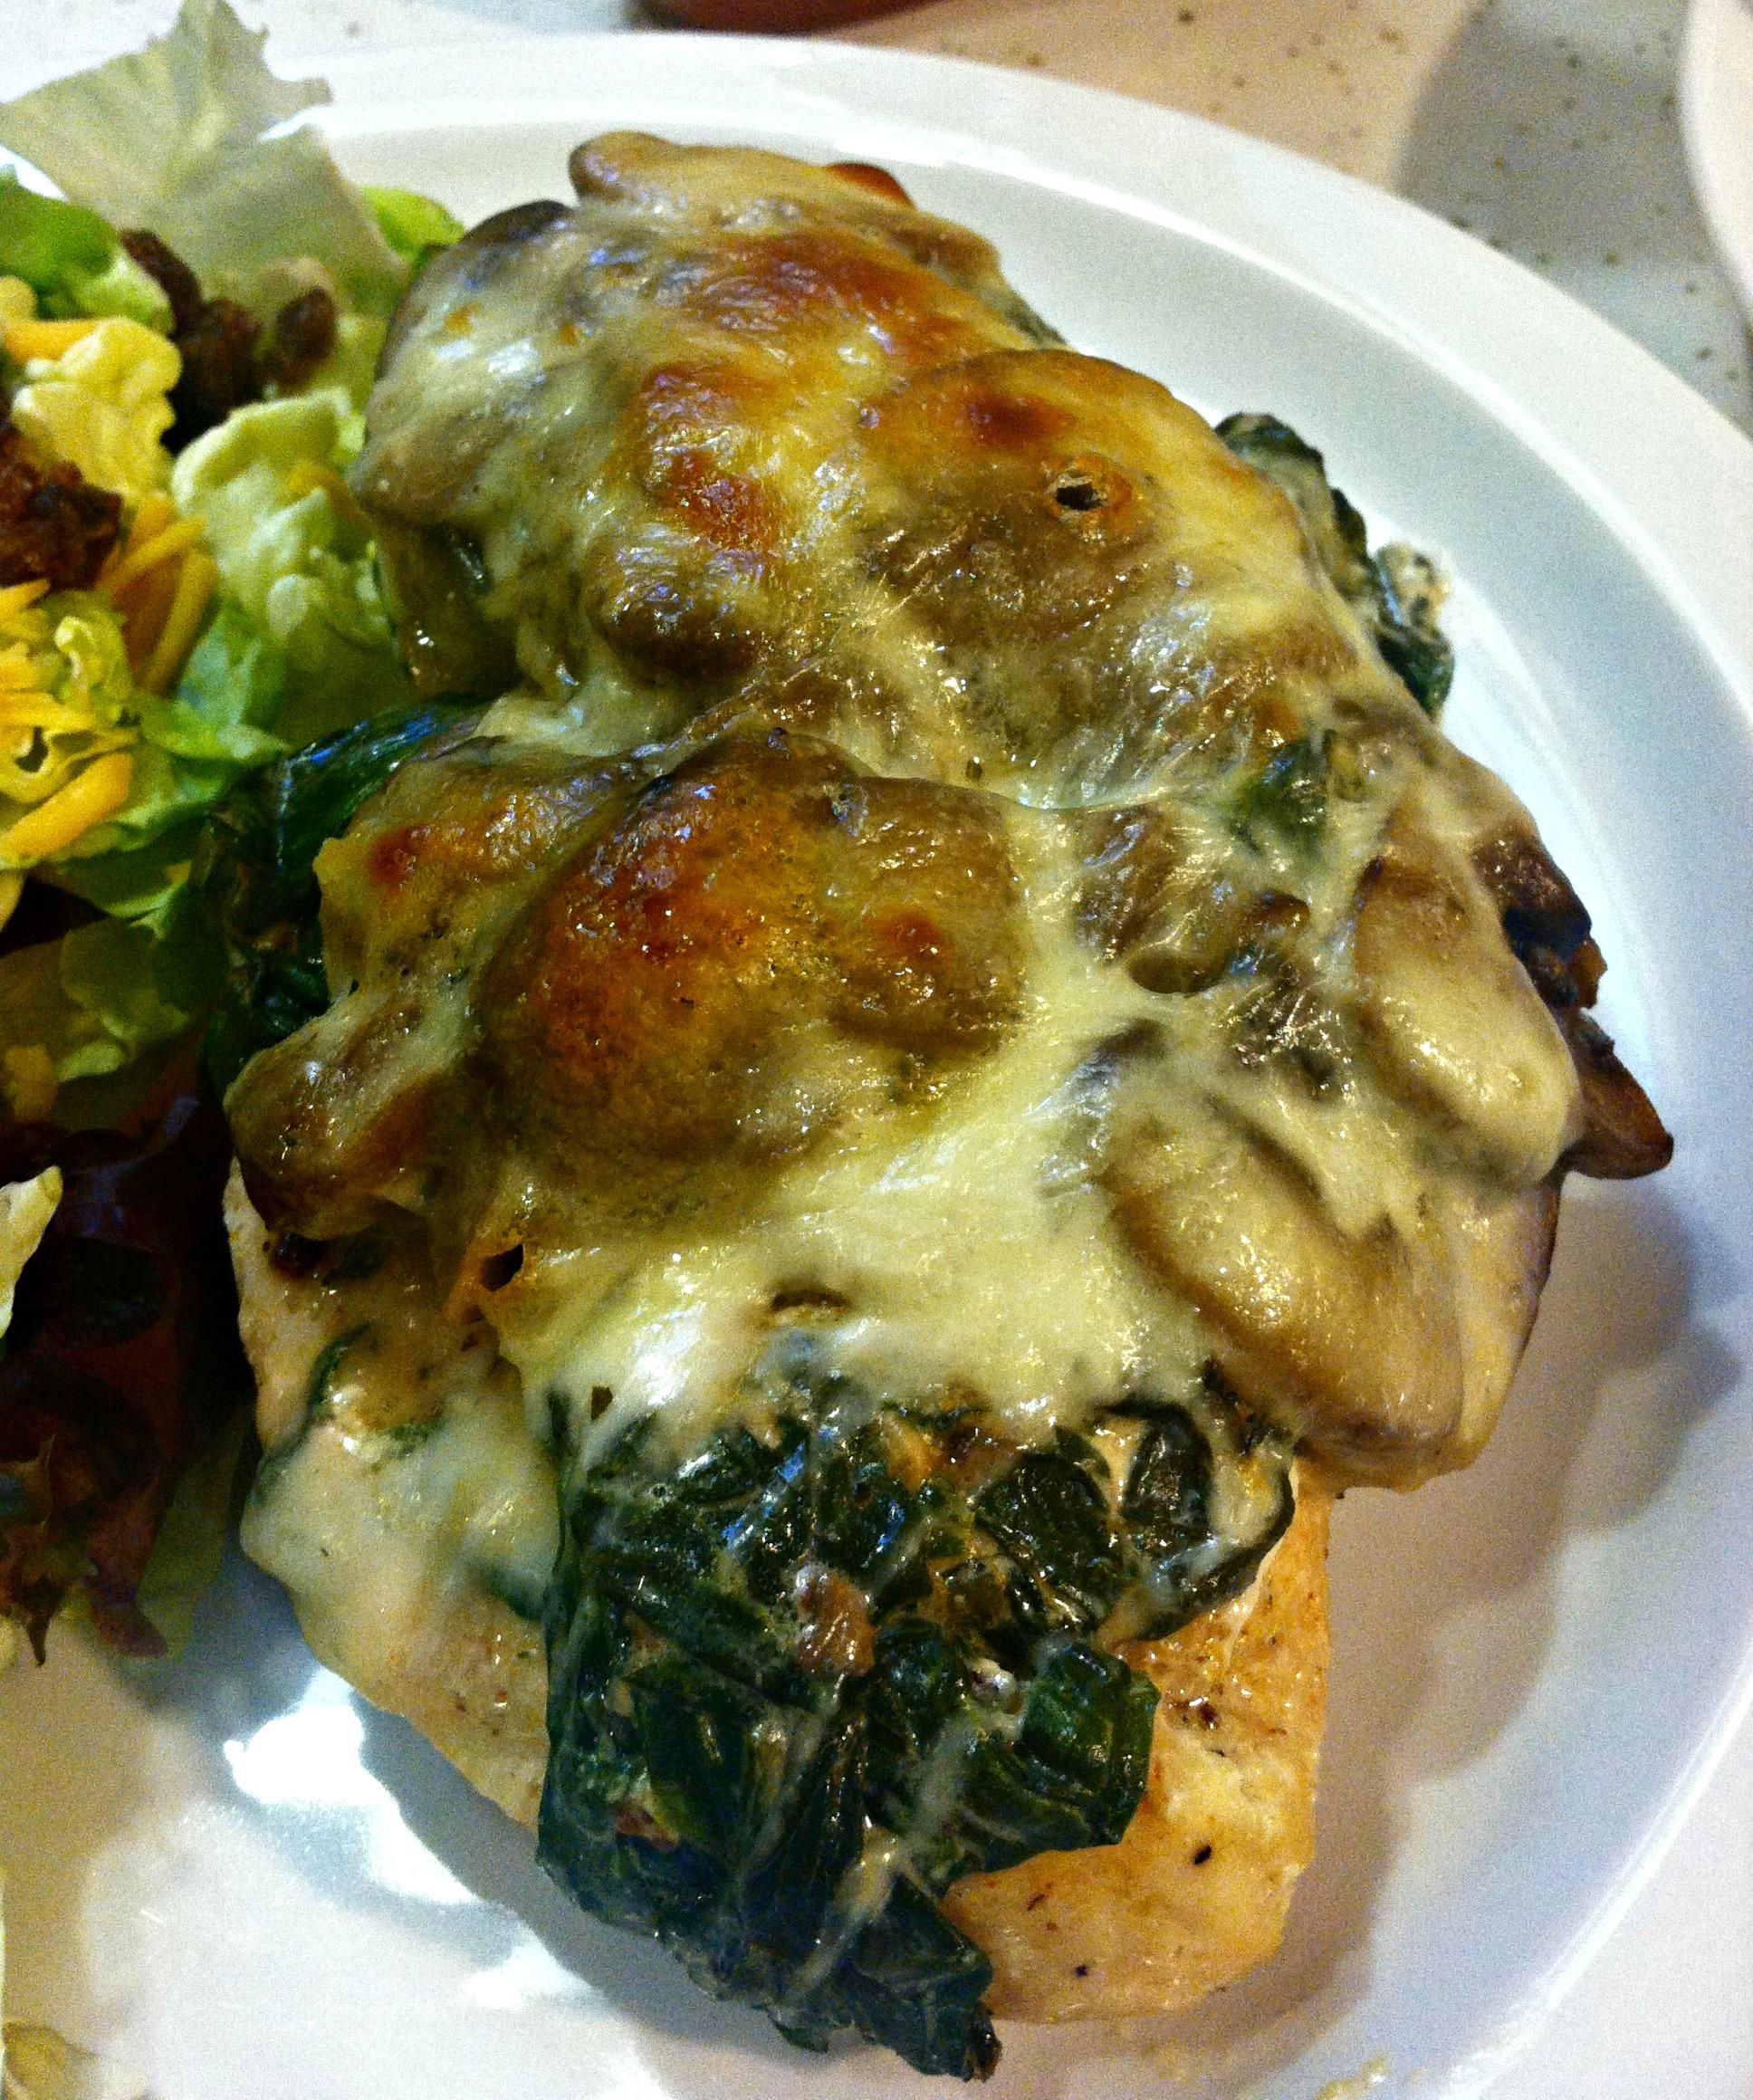 Mushroom & Creamed Spinach Smothered Chicken